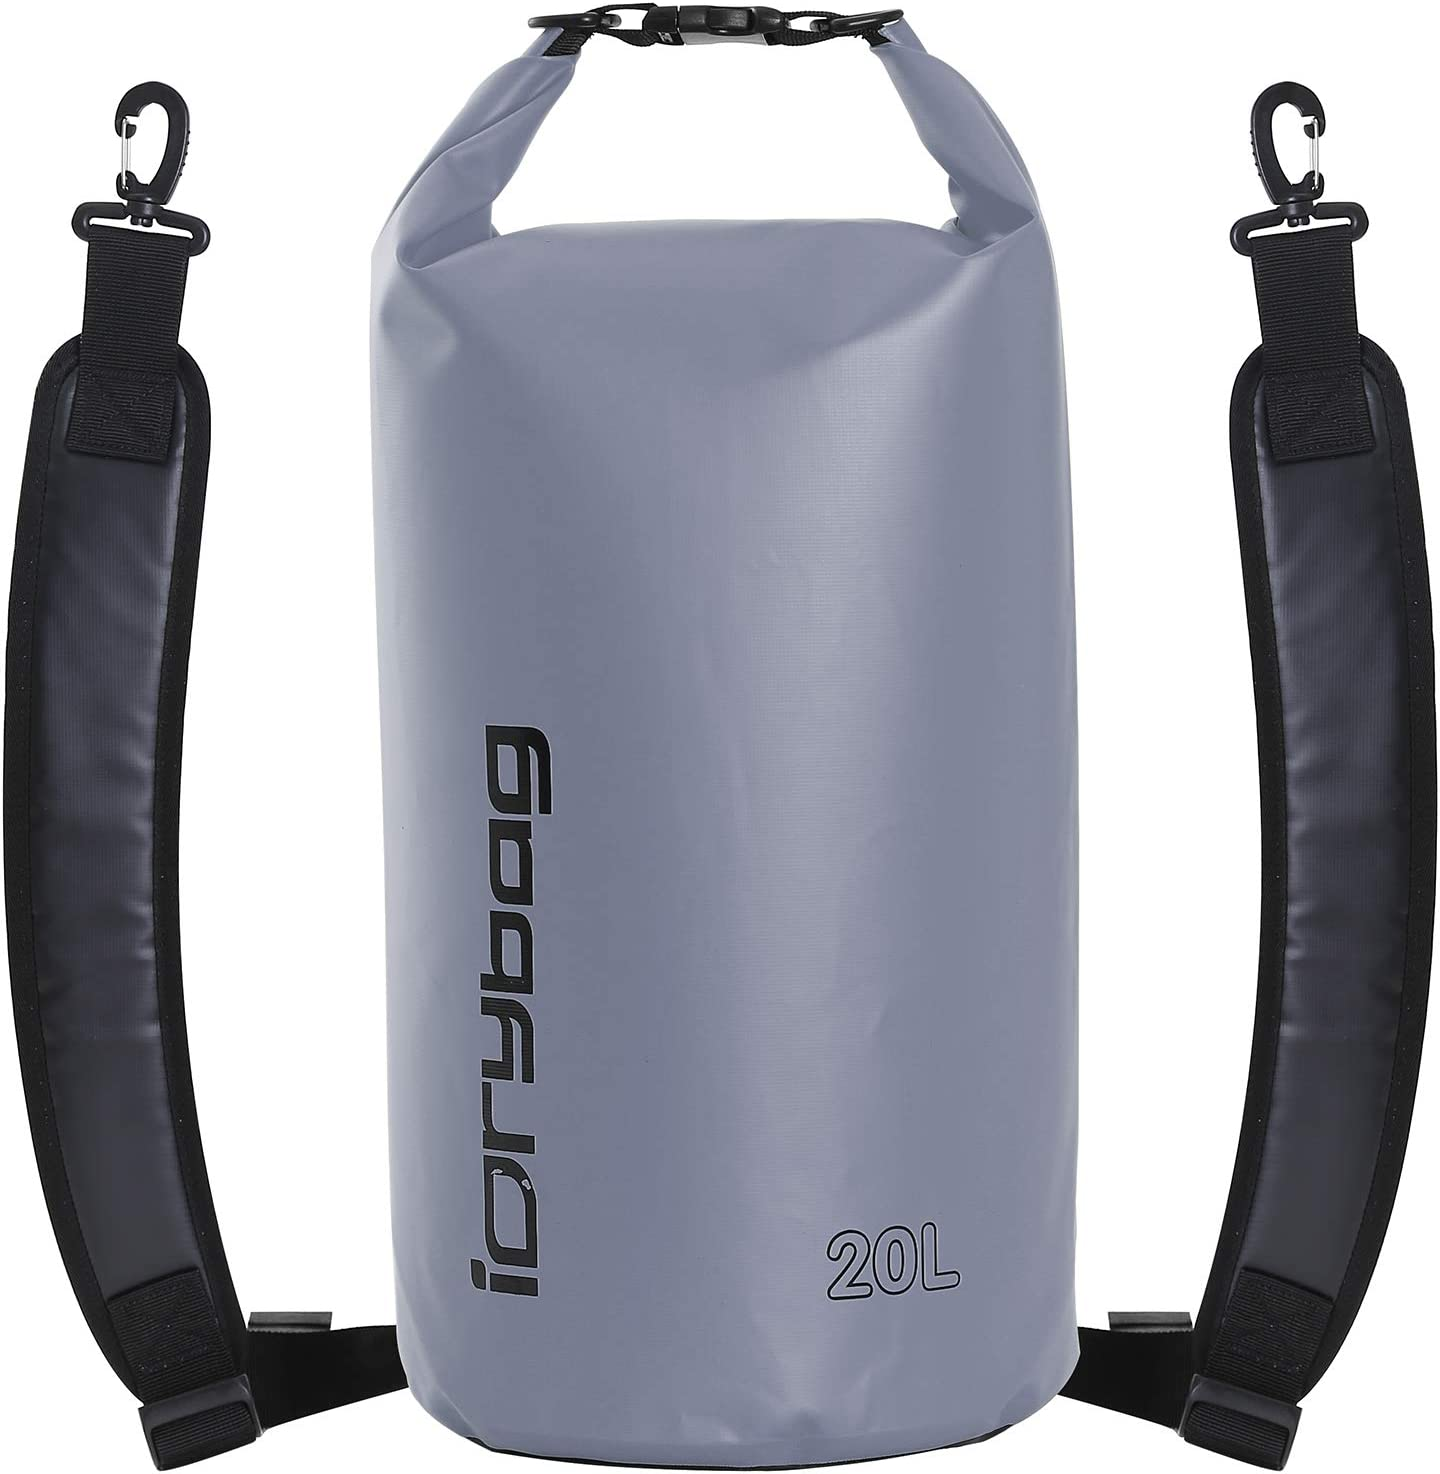 IDRYBAG Dry Bag Waterproof Floating, PVC Waterproof Bag Roll Top, 2L/5L/10L/15L/20L Dry Bag Kayak Storage for Kayaking, Boating, Rafting, Swimming, Hiking, Camping, Travel, Beach